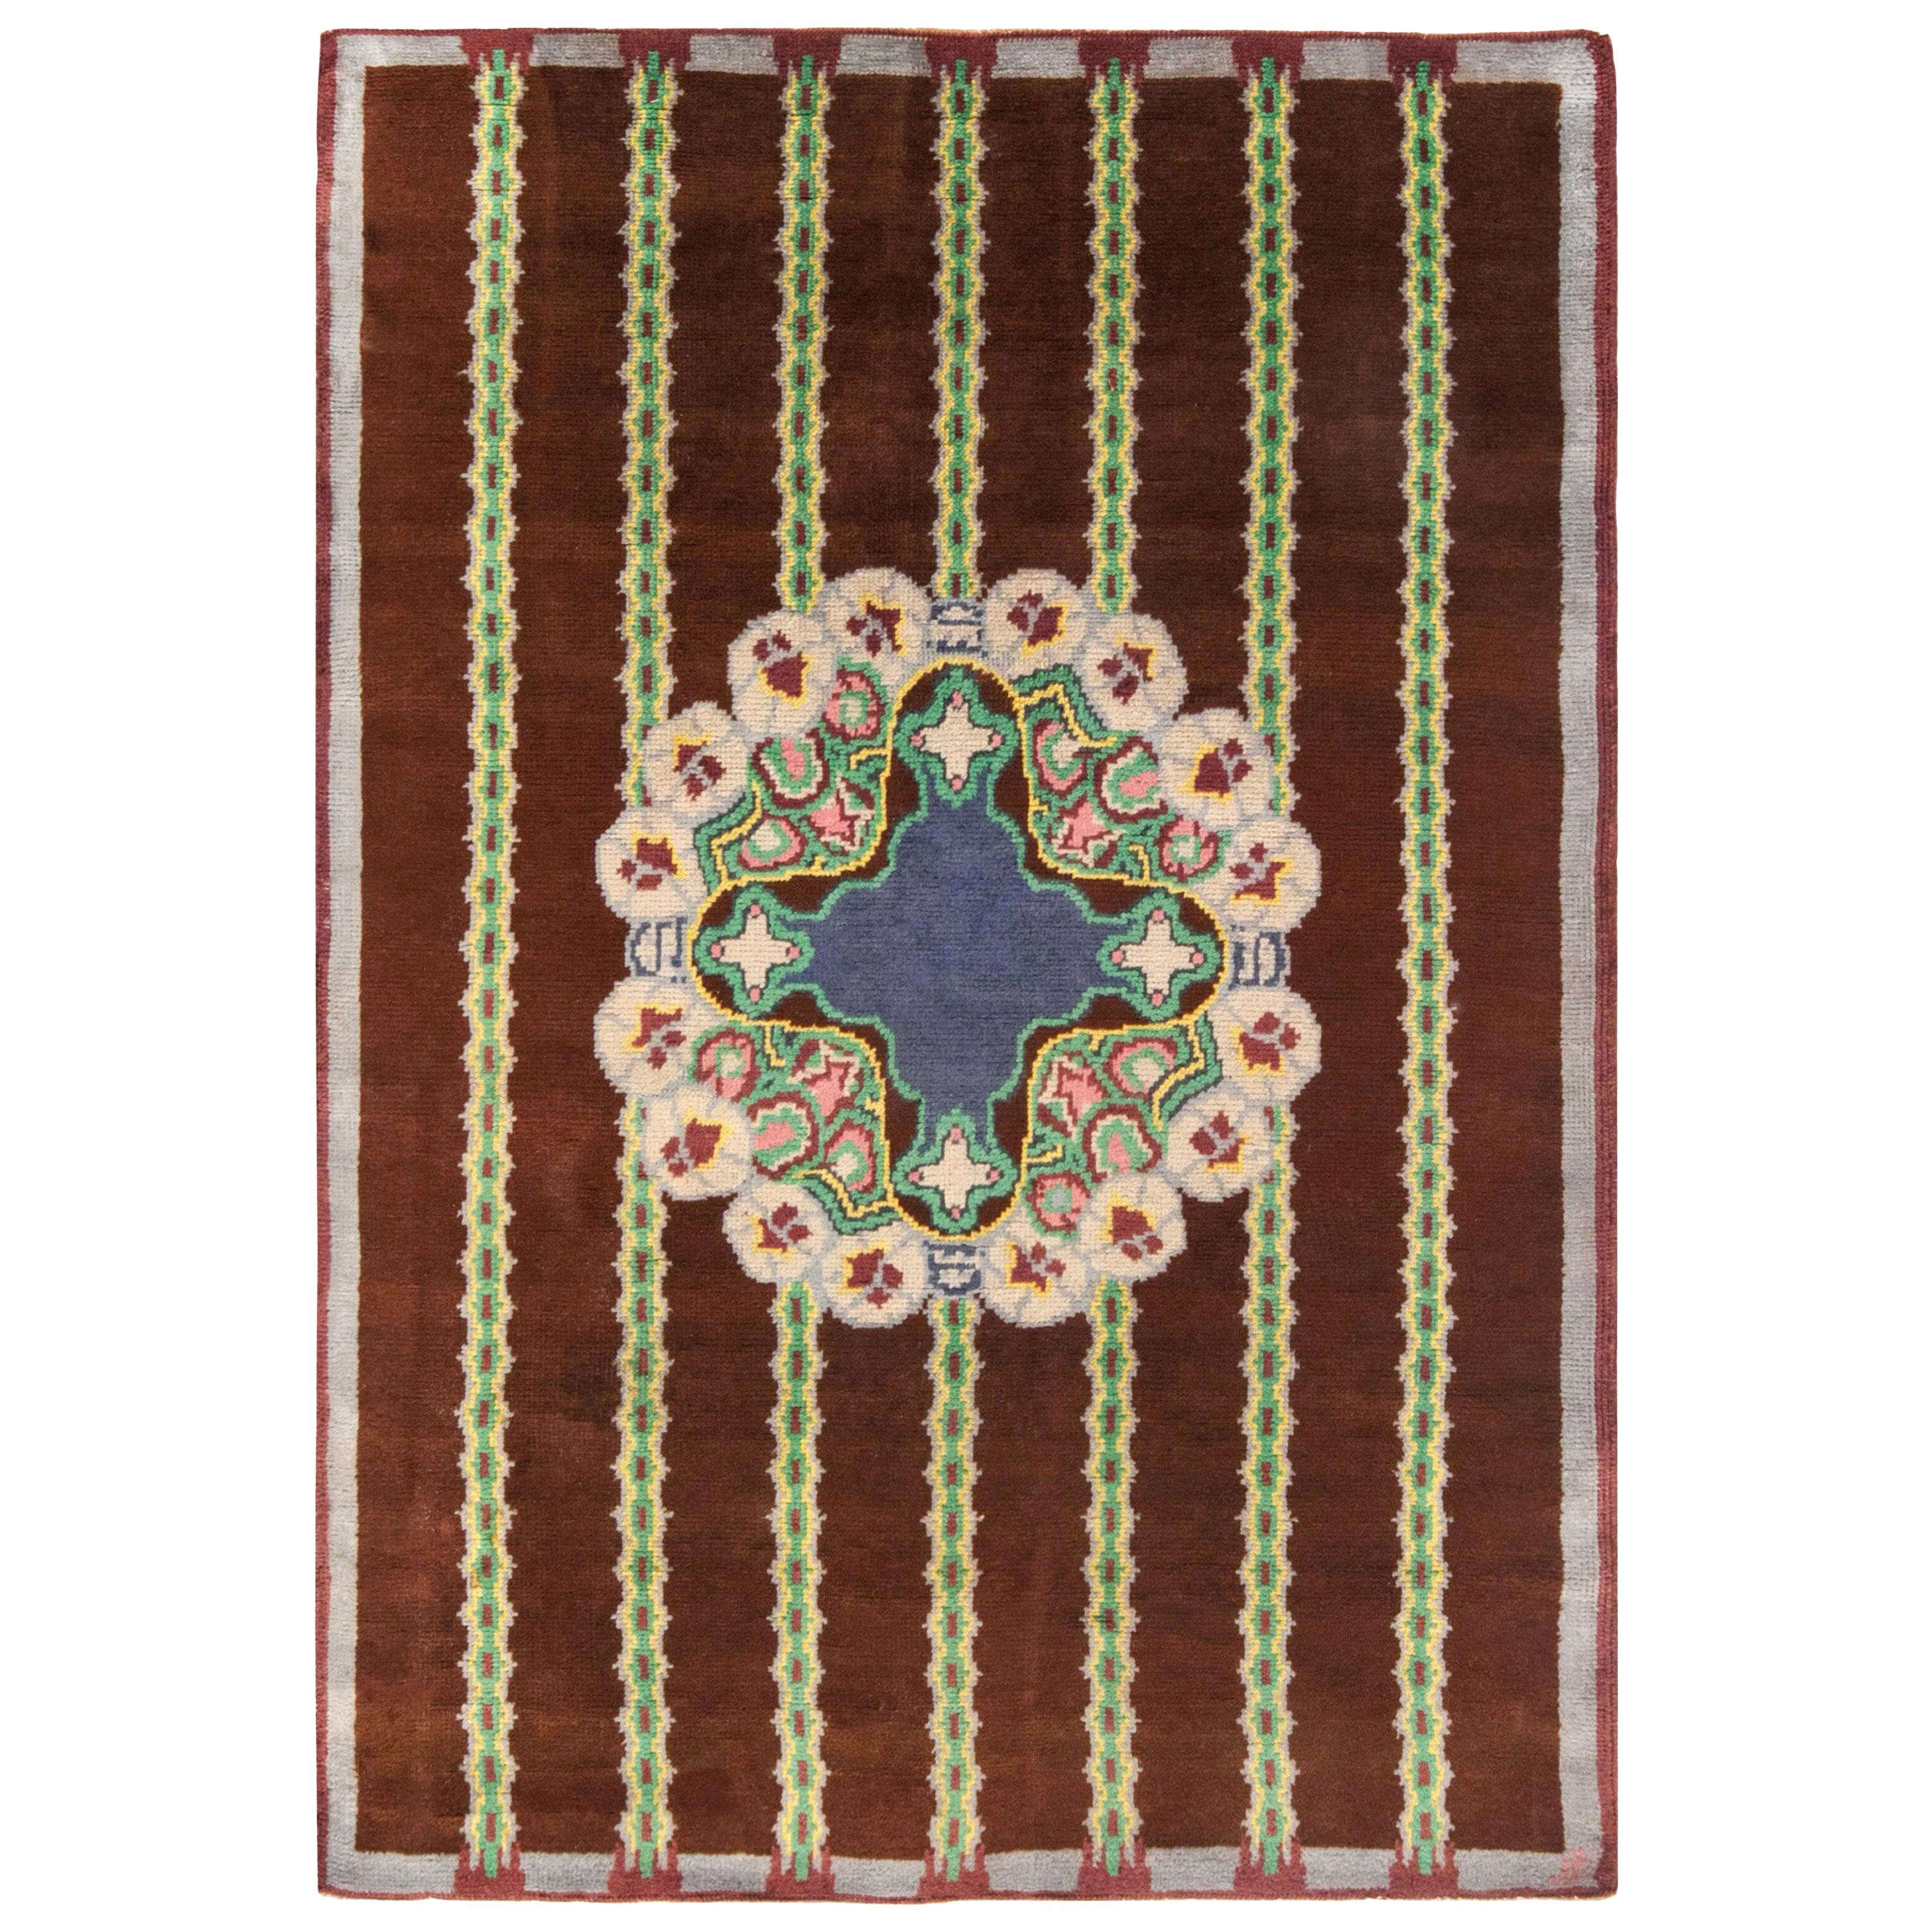 French Art Deco Brown, Green, Yellow, Blue, Lilac Handmade Wool Rug